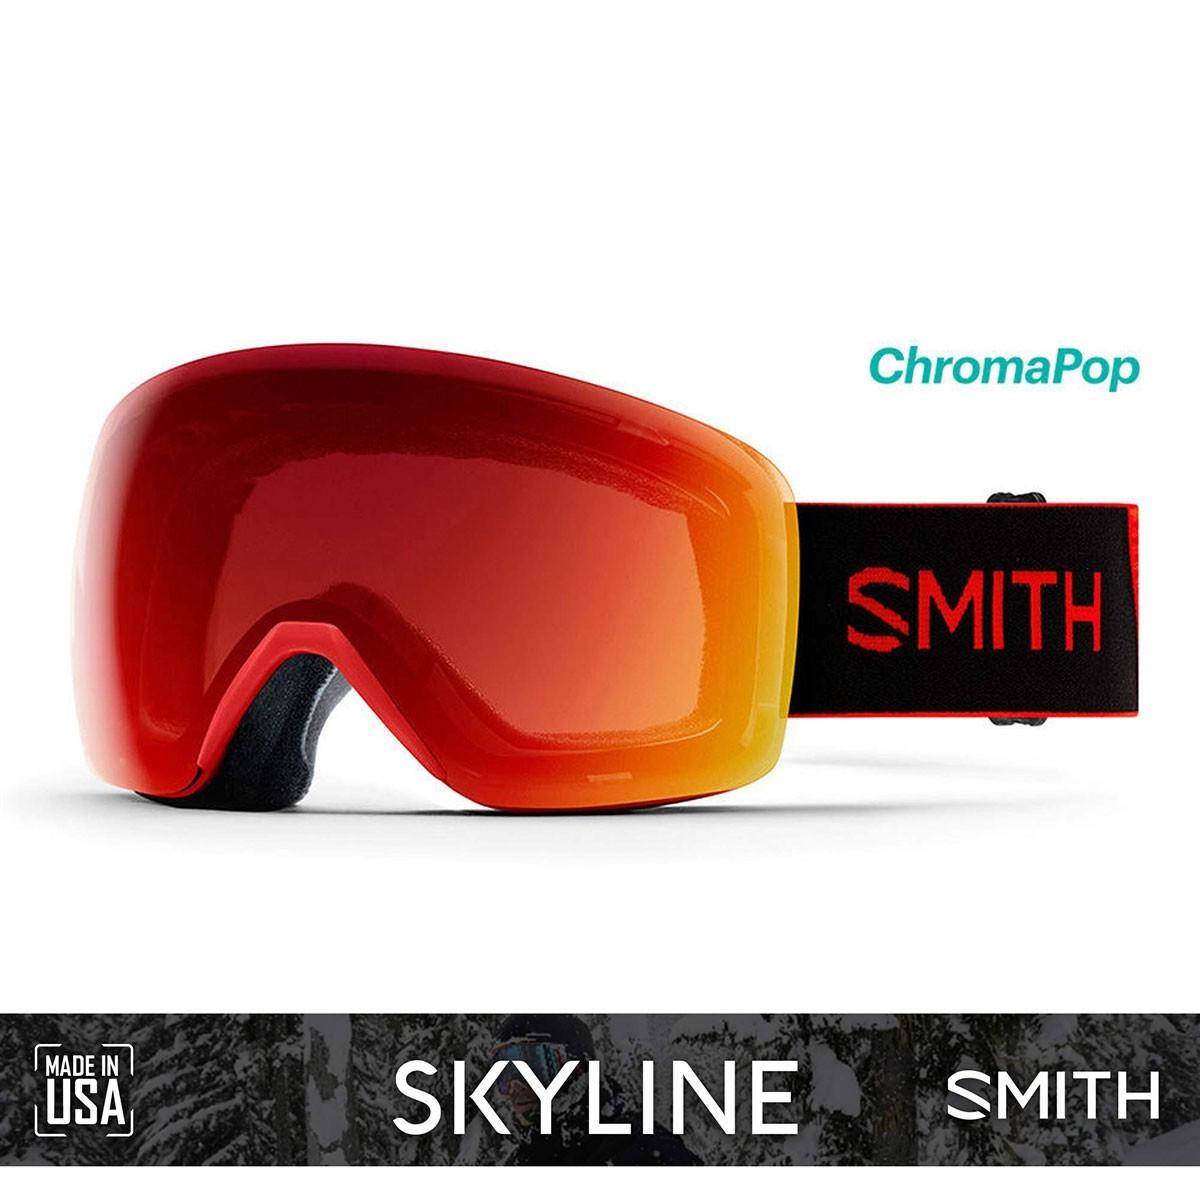 SMITH SKYLINE Rise 1920 | S3-S2 CHROMAPOP Photochromic Red Mirror - Изображение - AQUAMATRIX